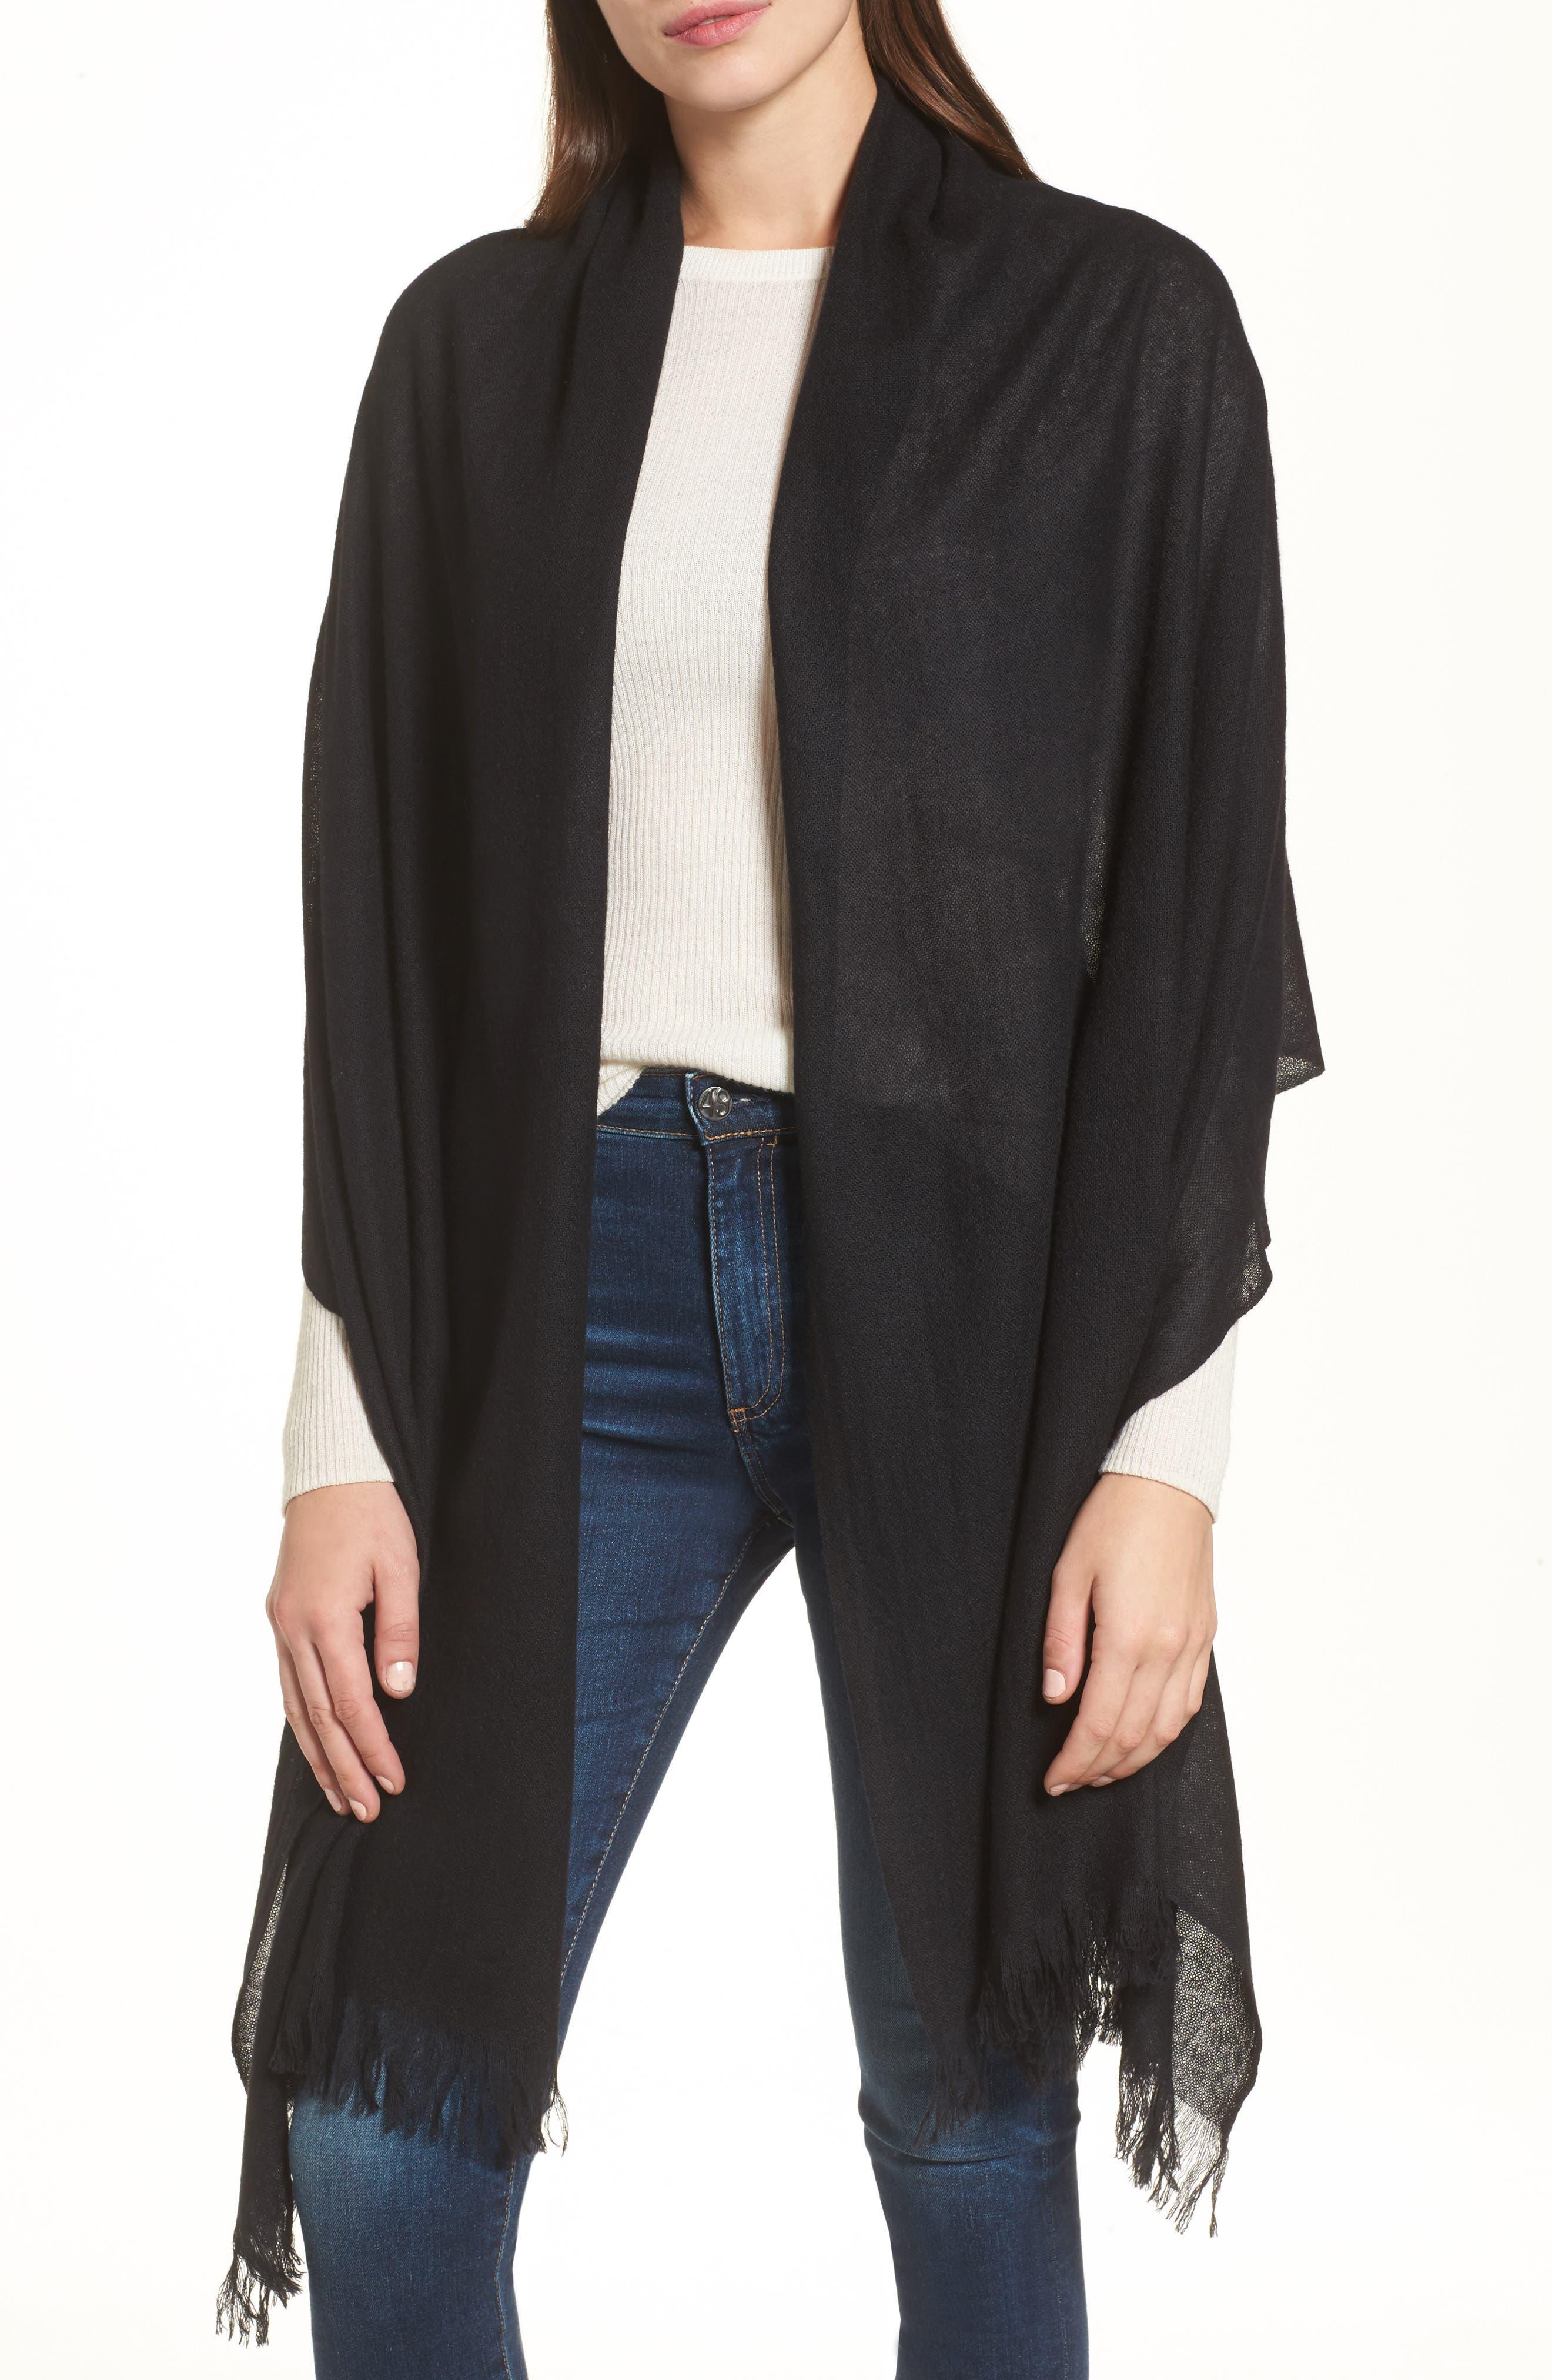 Caslon<sup>®</sup> Heathered Cashmere Gauze Scarf,                         Main,                         color, BLACK